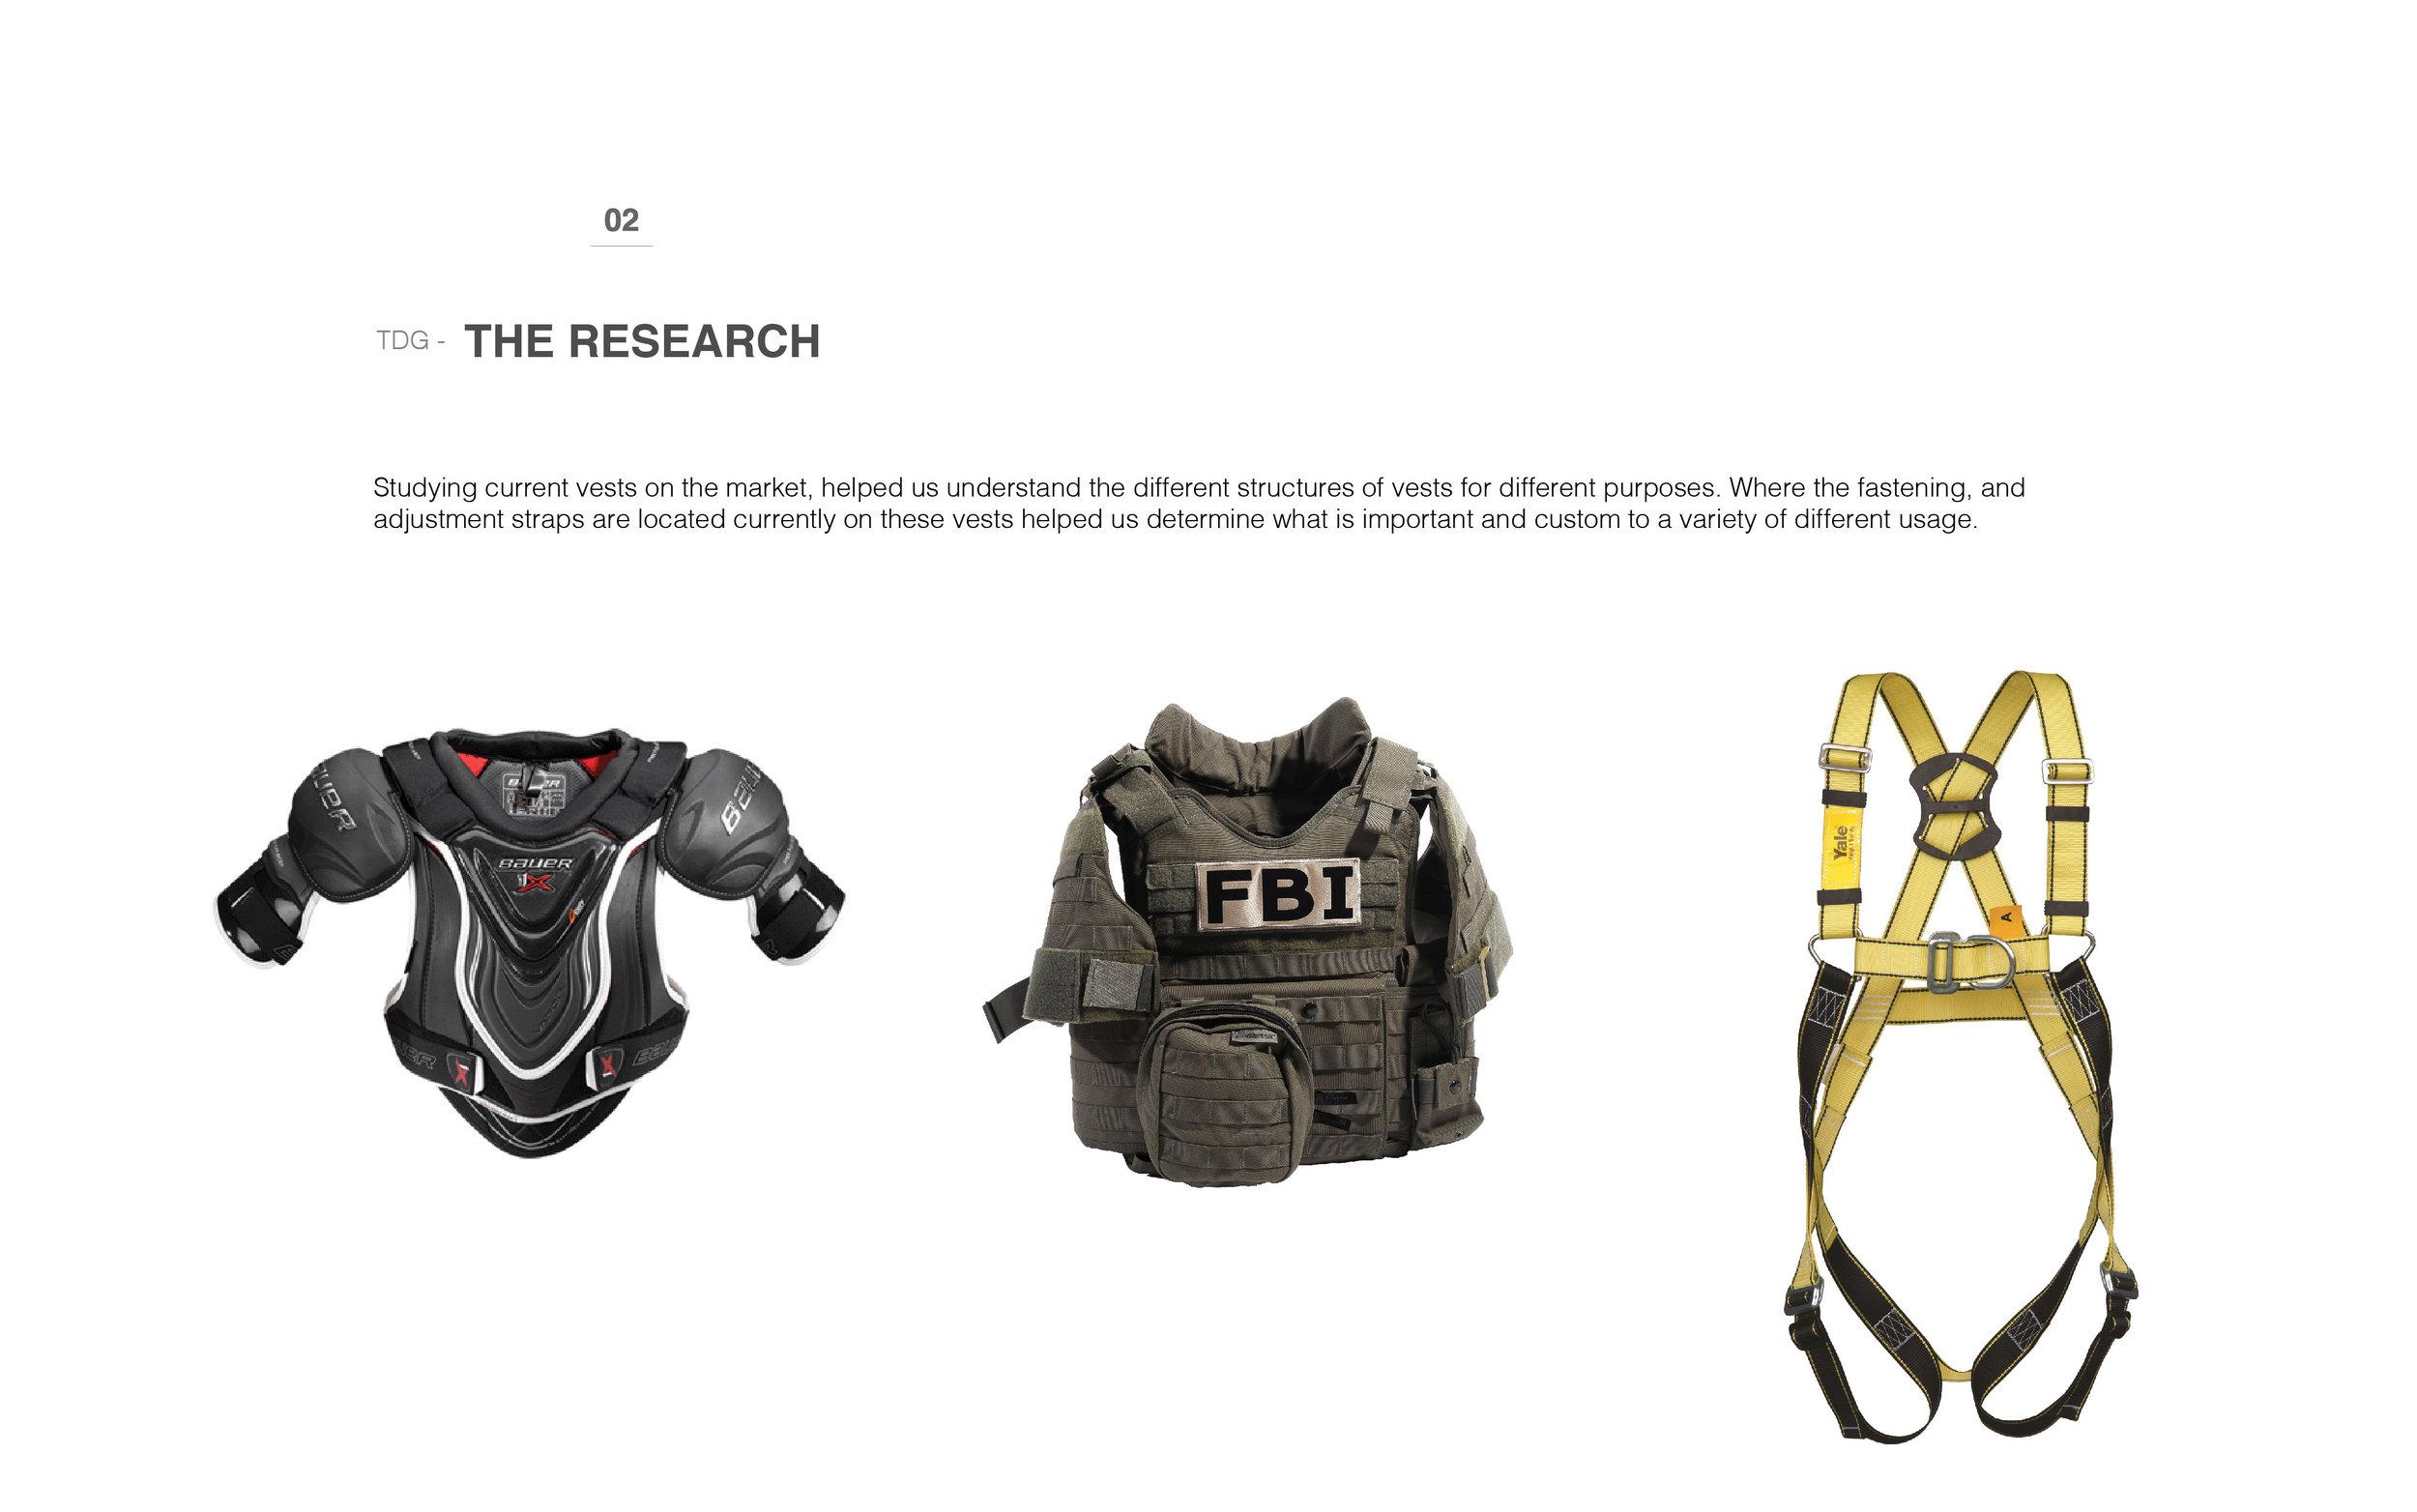 Research-02.jpg